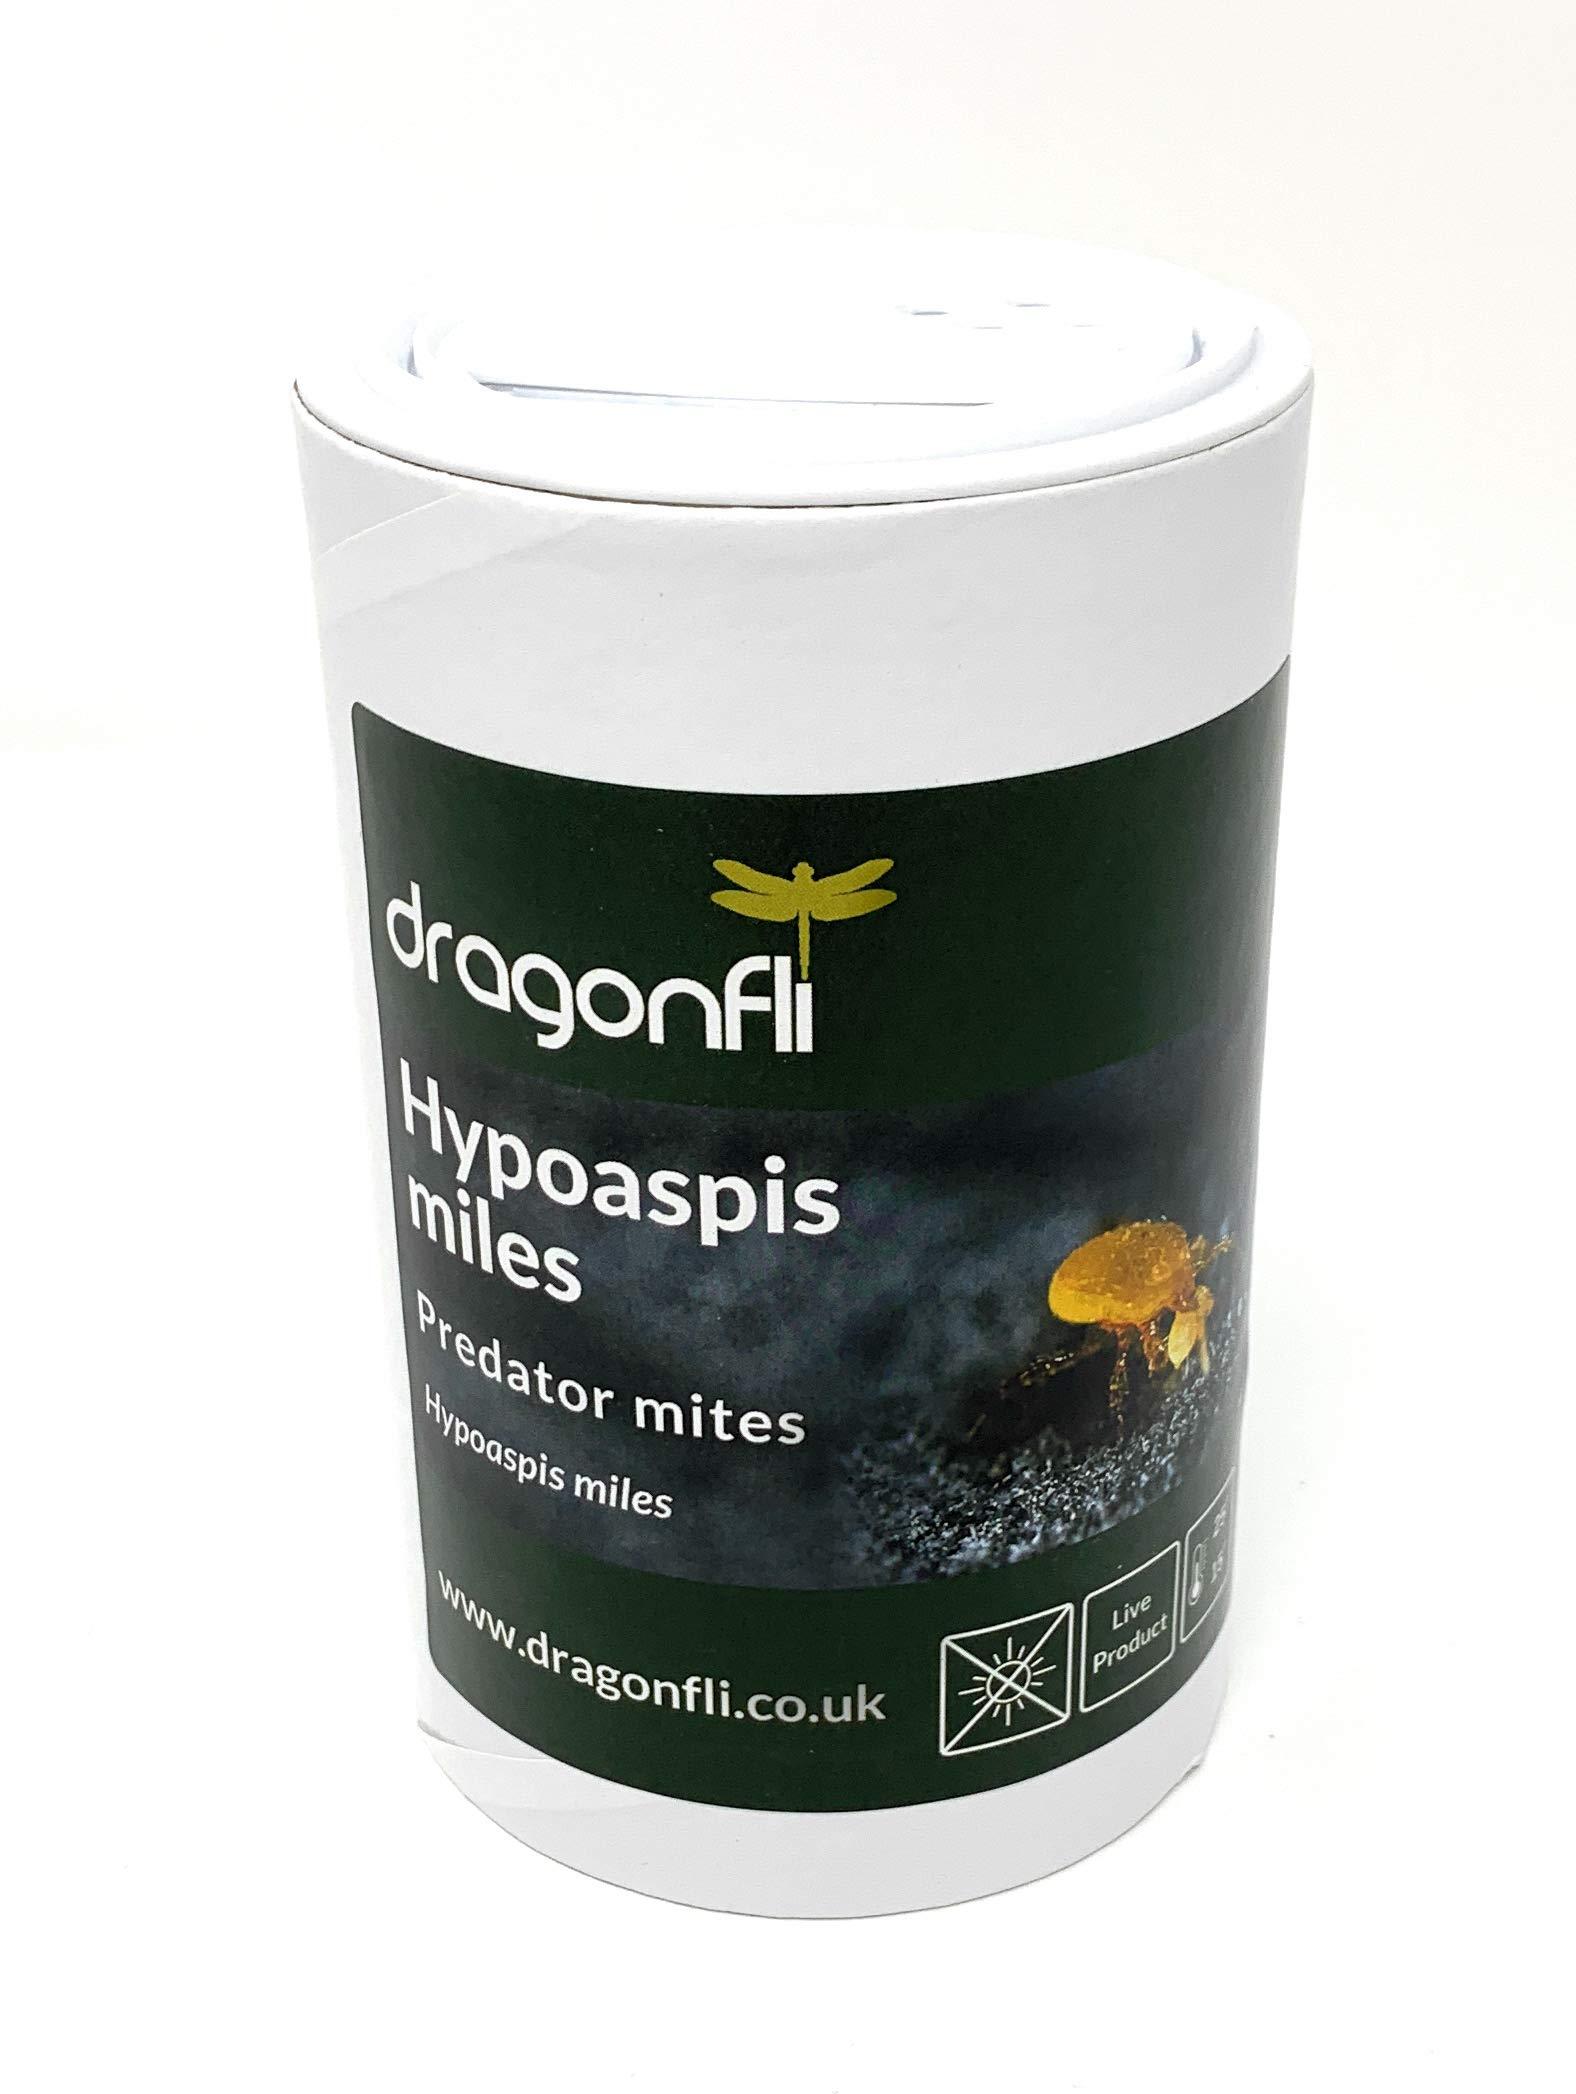 Dragonfli Hypoaspis Miles Predatory Mites - Kill Sciarid Fly/Fungus Fly Larvae & Thrip Pupae (2000)